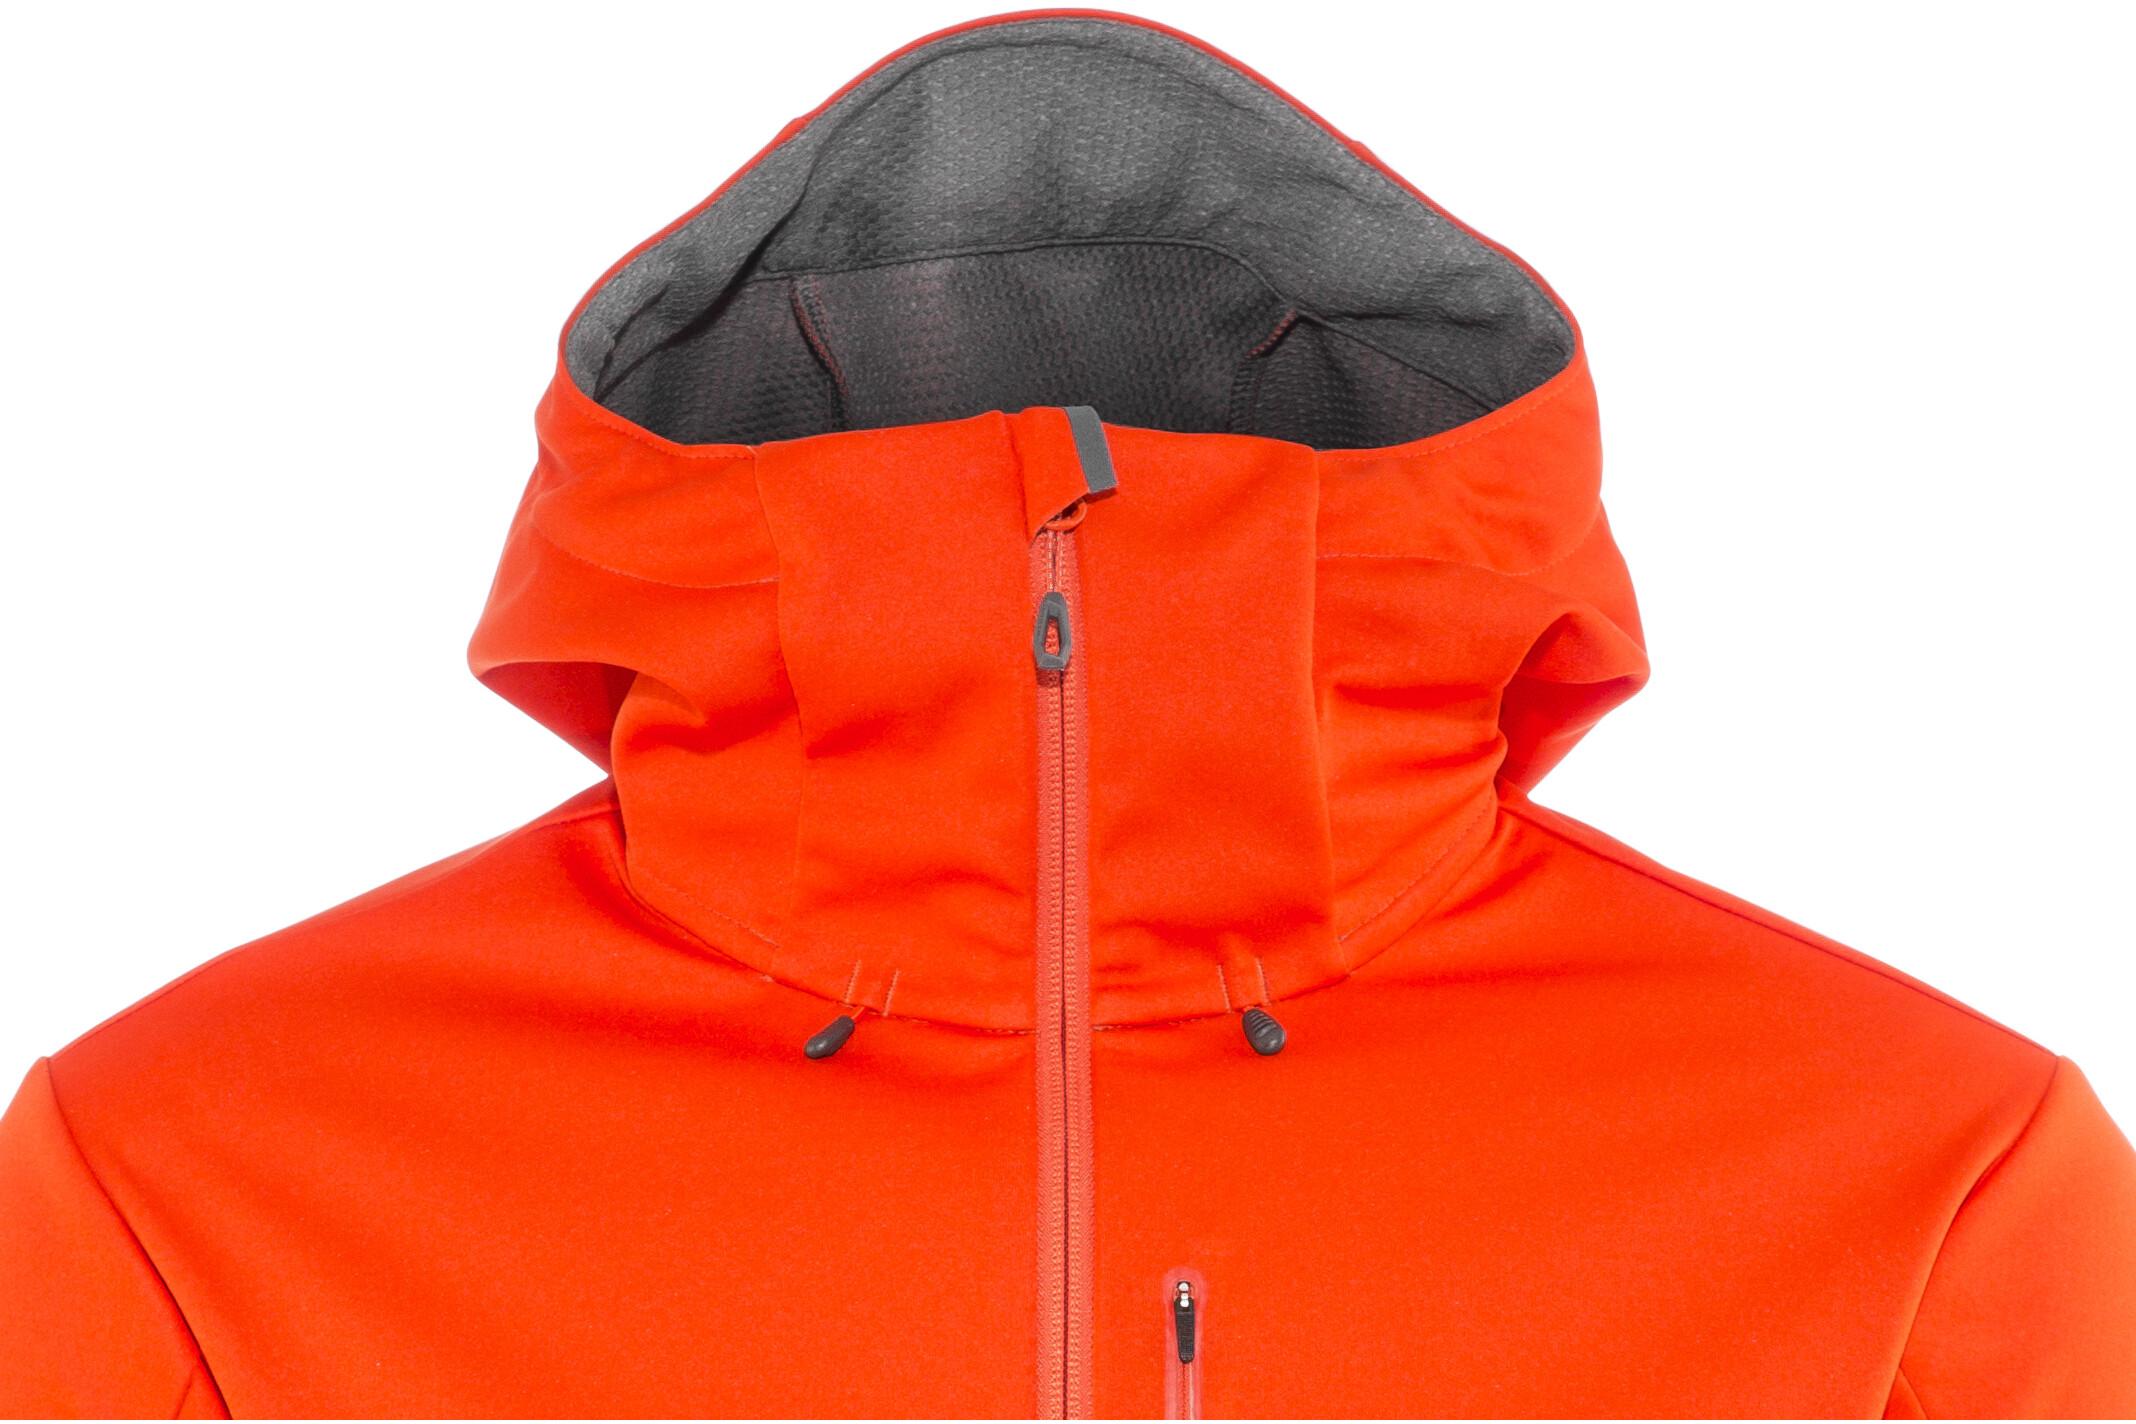 Klettergurt Mammut Größentabelle : Mammut ultimate v so hooded jacket men dark orange titanium melange